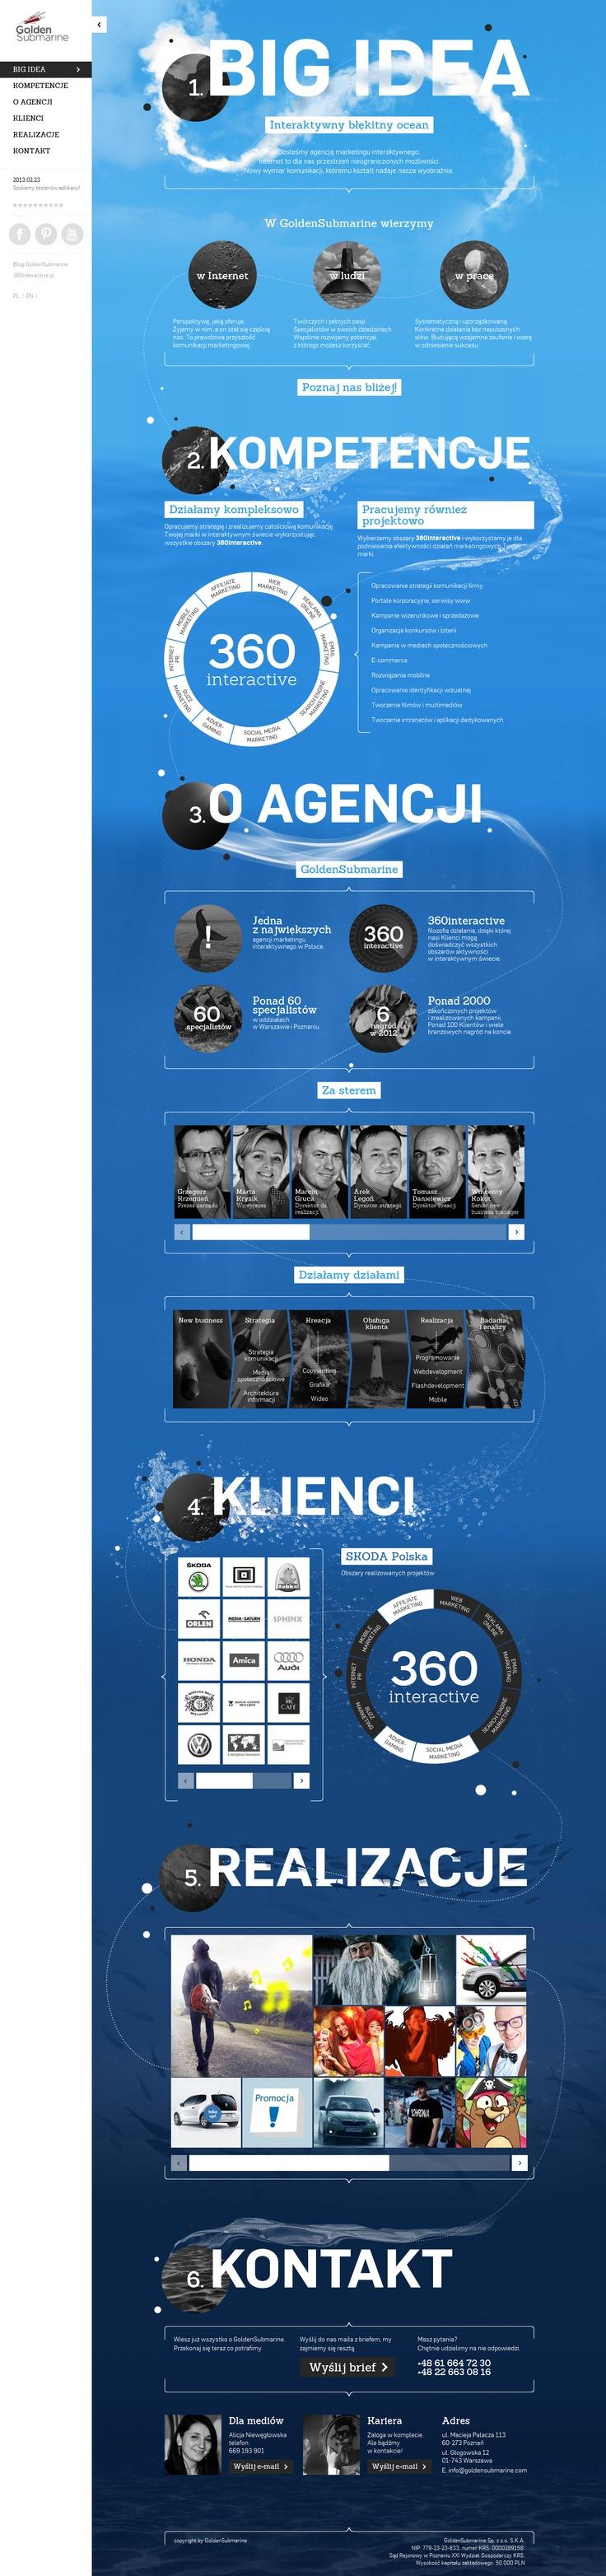 Responsive web design GoldenSubmarine - www